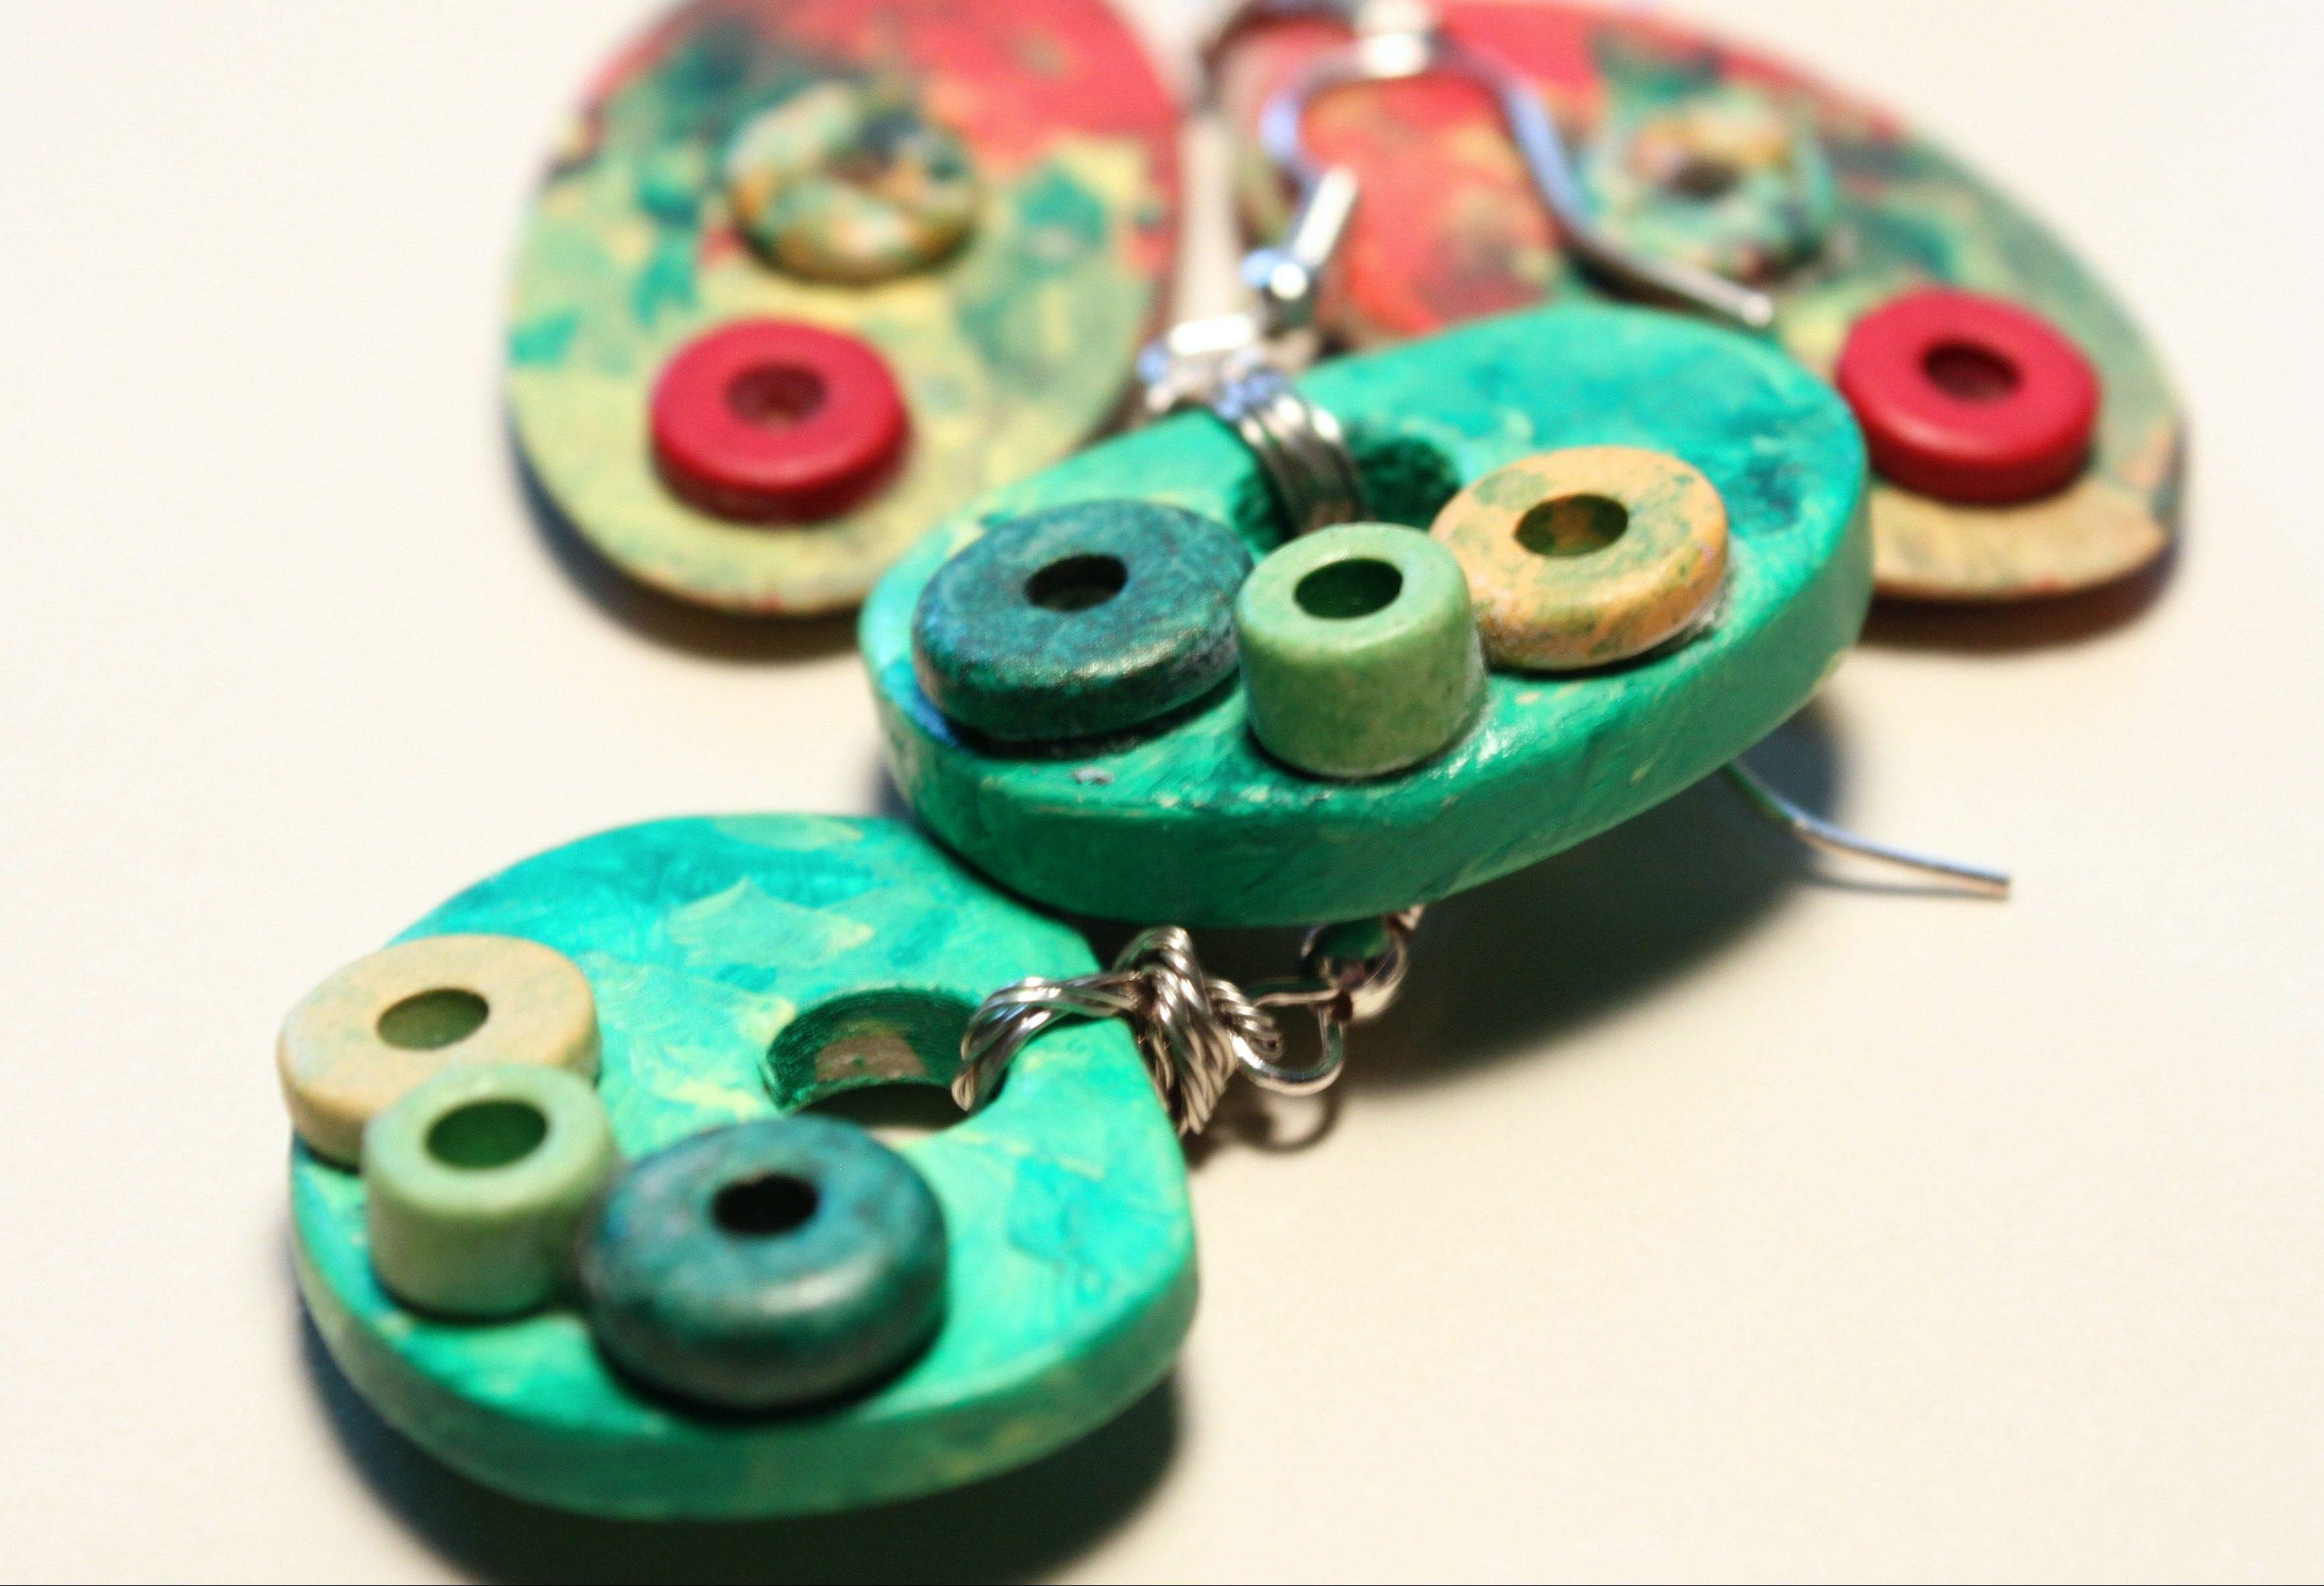 Jewellery by Kostadina Nacheva